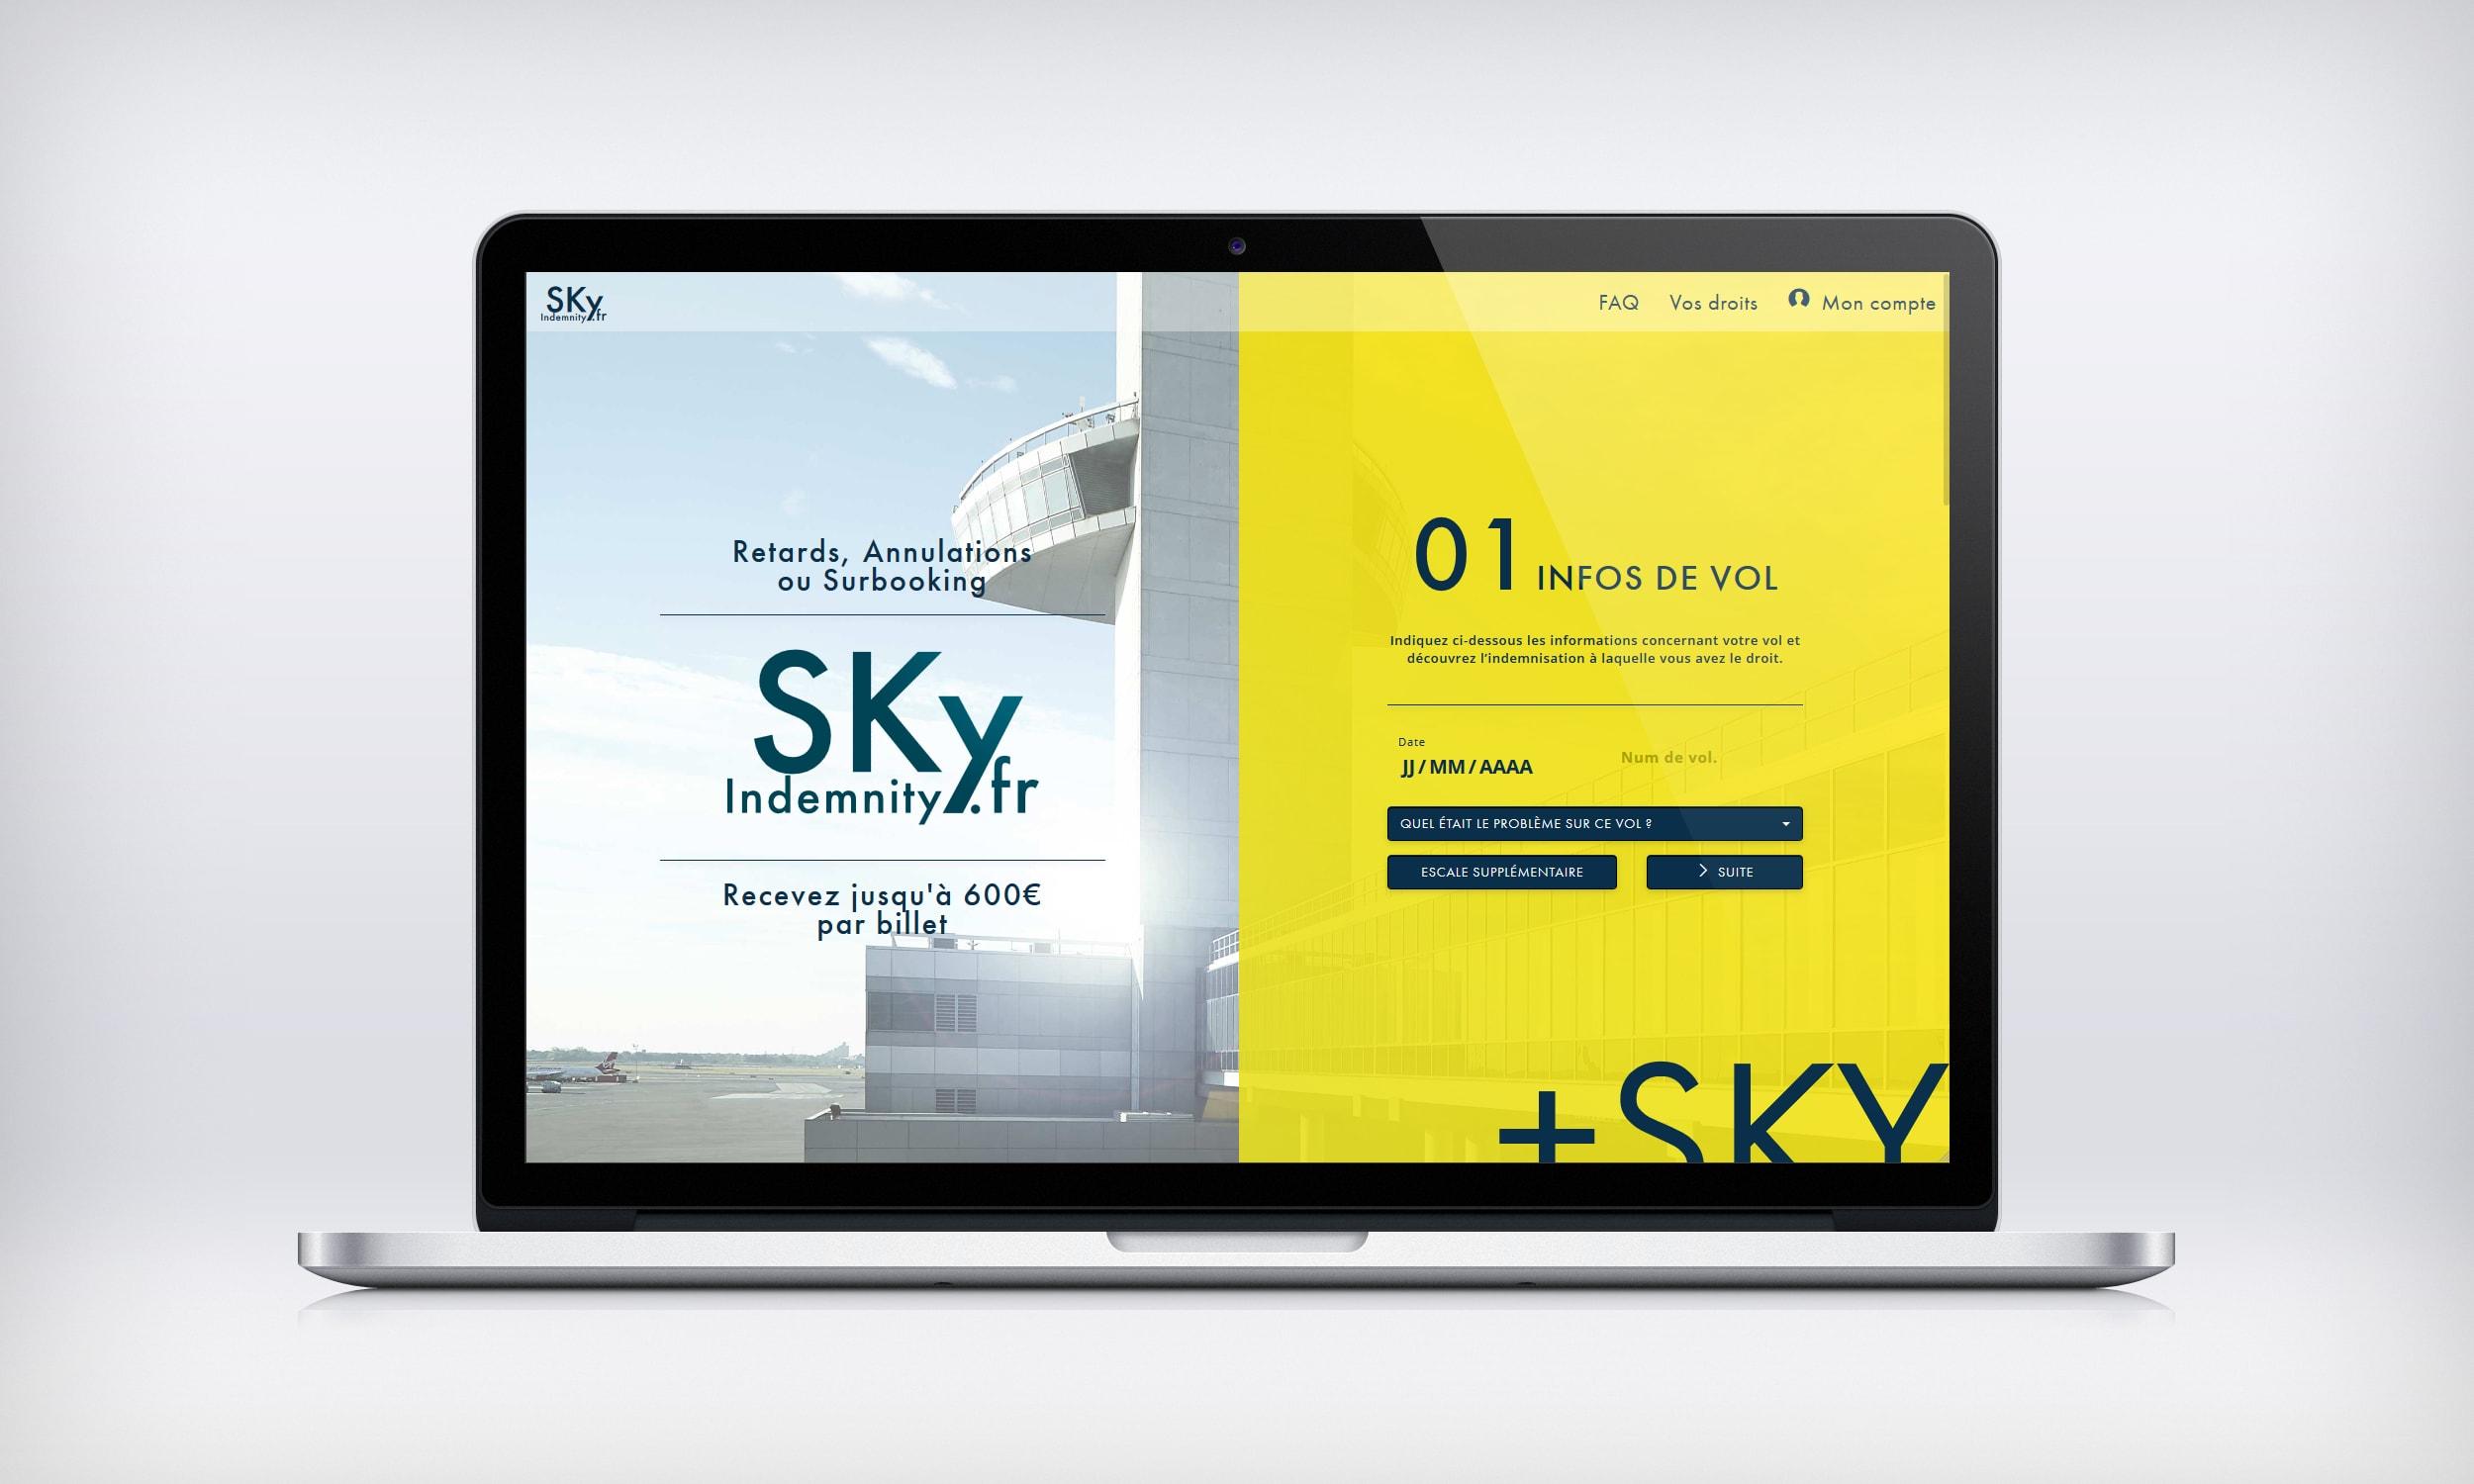 Sky indemnity